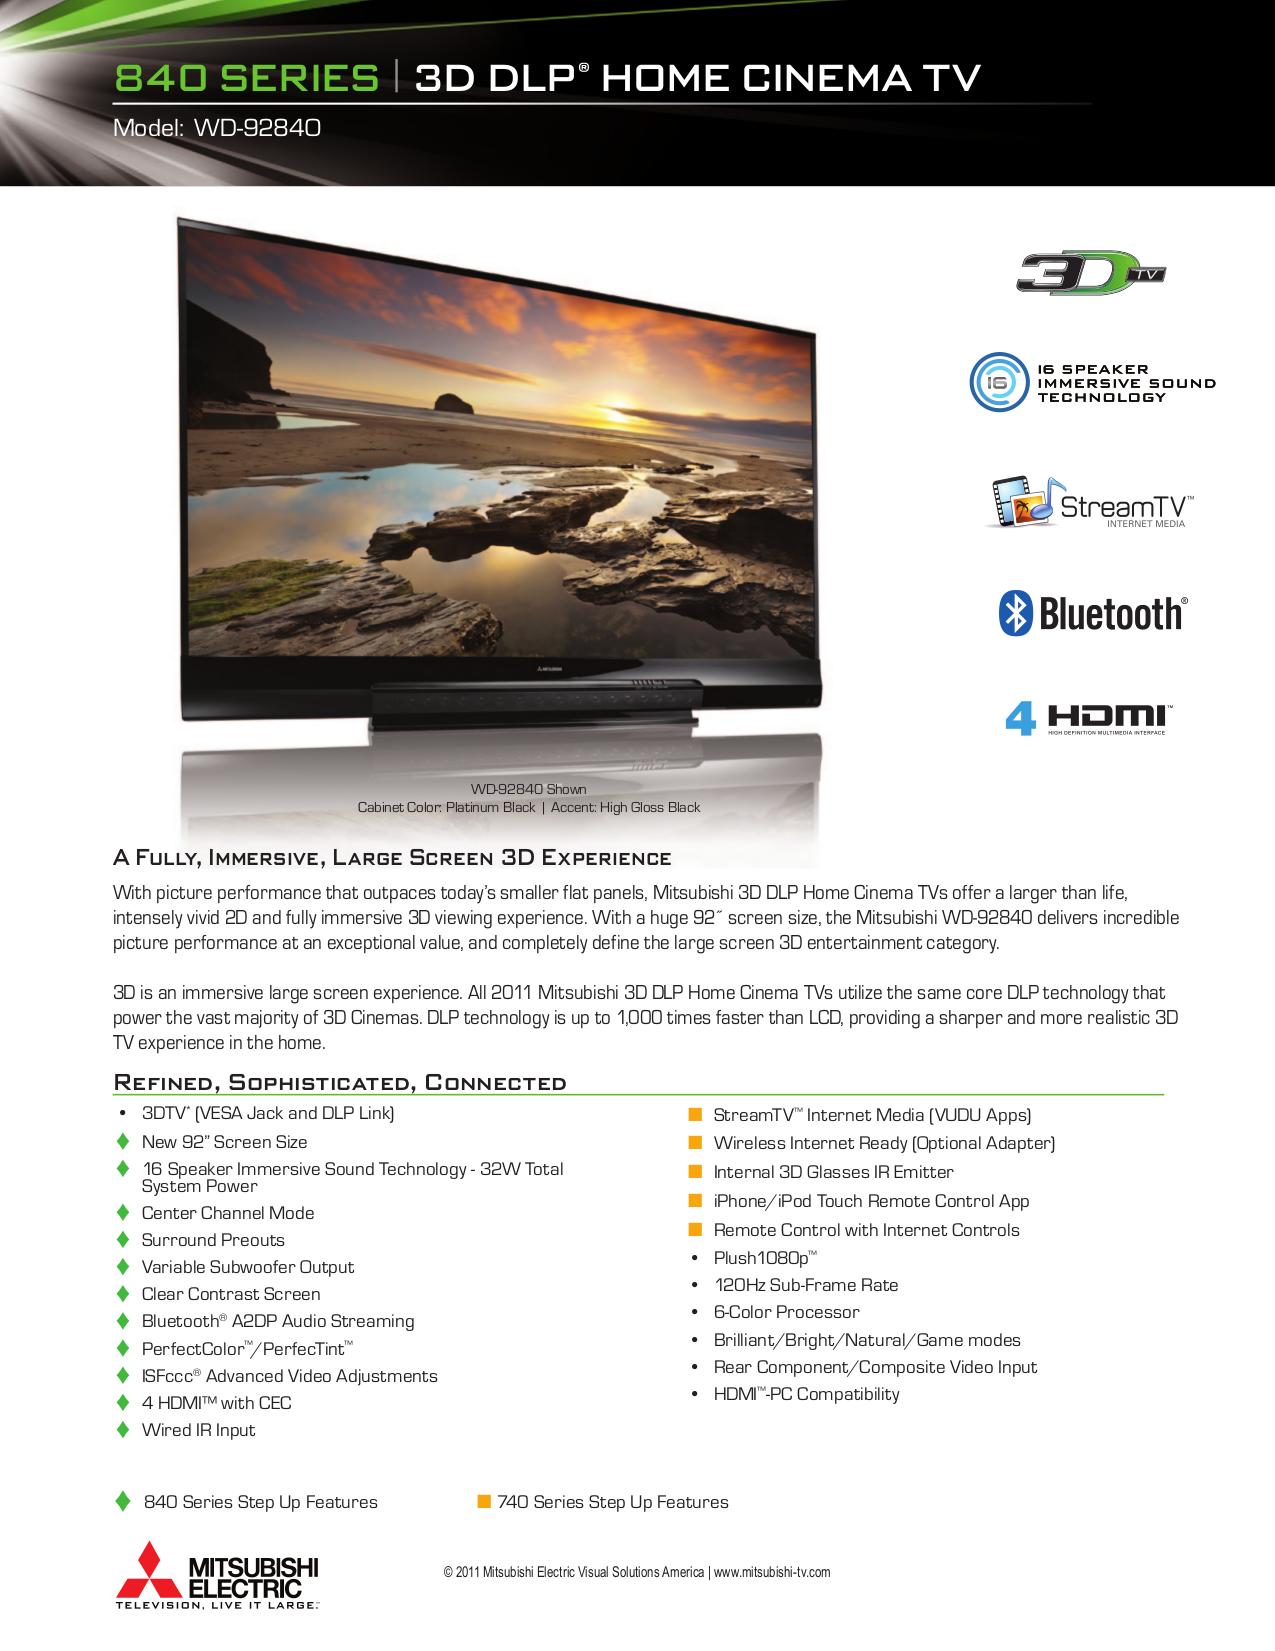 Download Free Pdf For Mitsubishi Wd 92840 Tv Manual Schematic Dlp